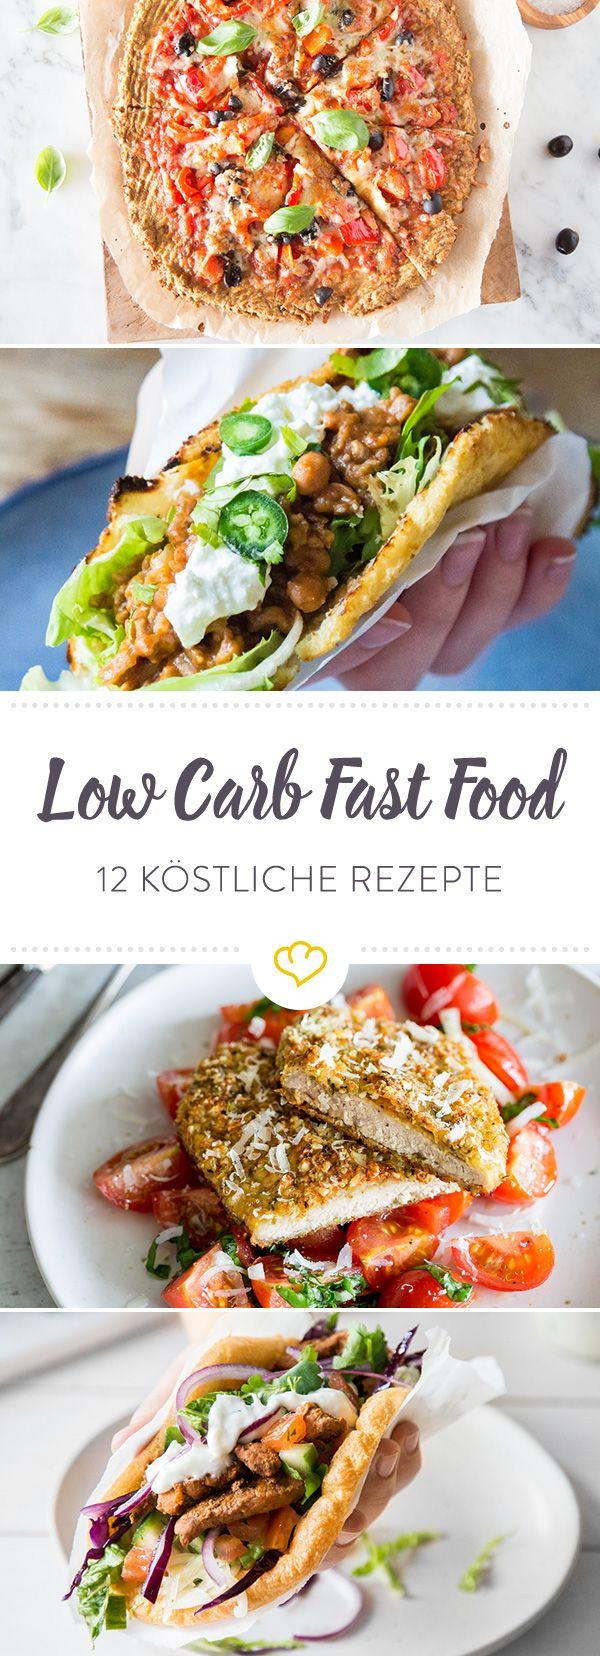 Bye, bye Kohlenhydrate! 12 Ideen für Low Carb Fast Food #healthysnacks